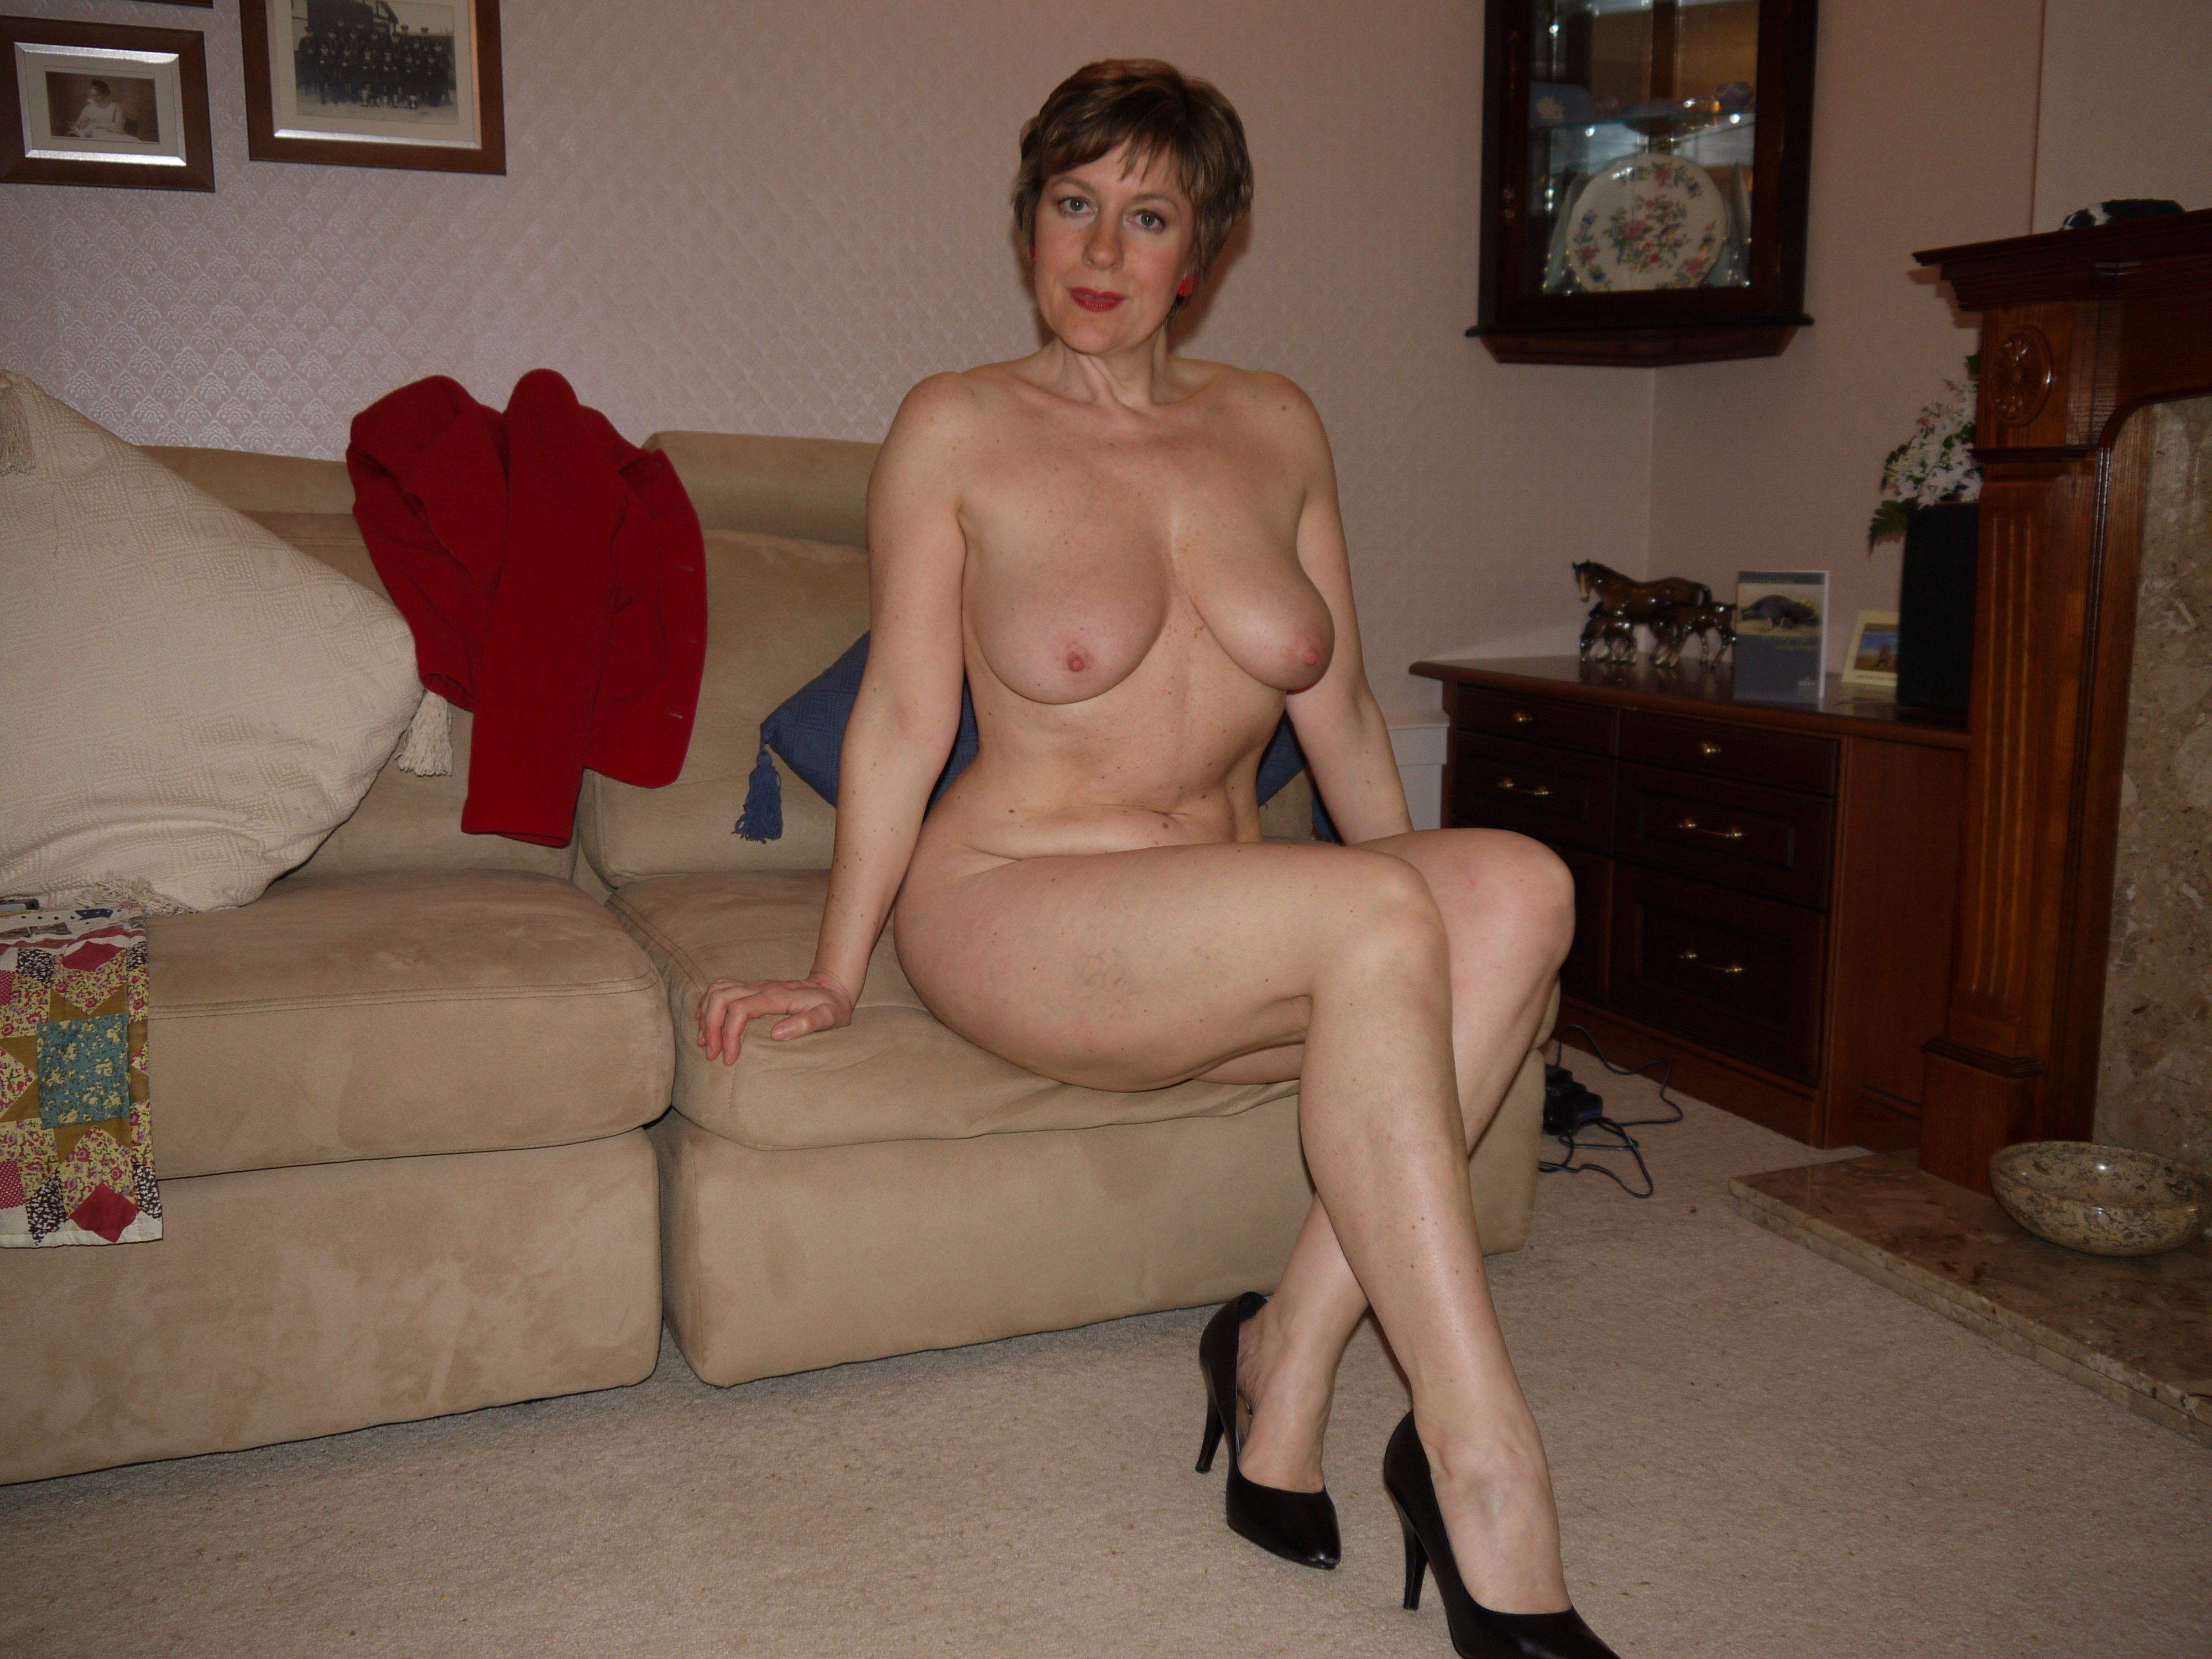 Эротические мама фото, Милфы фото секса с мамочками и зрелками 8 фотография